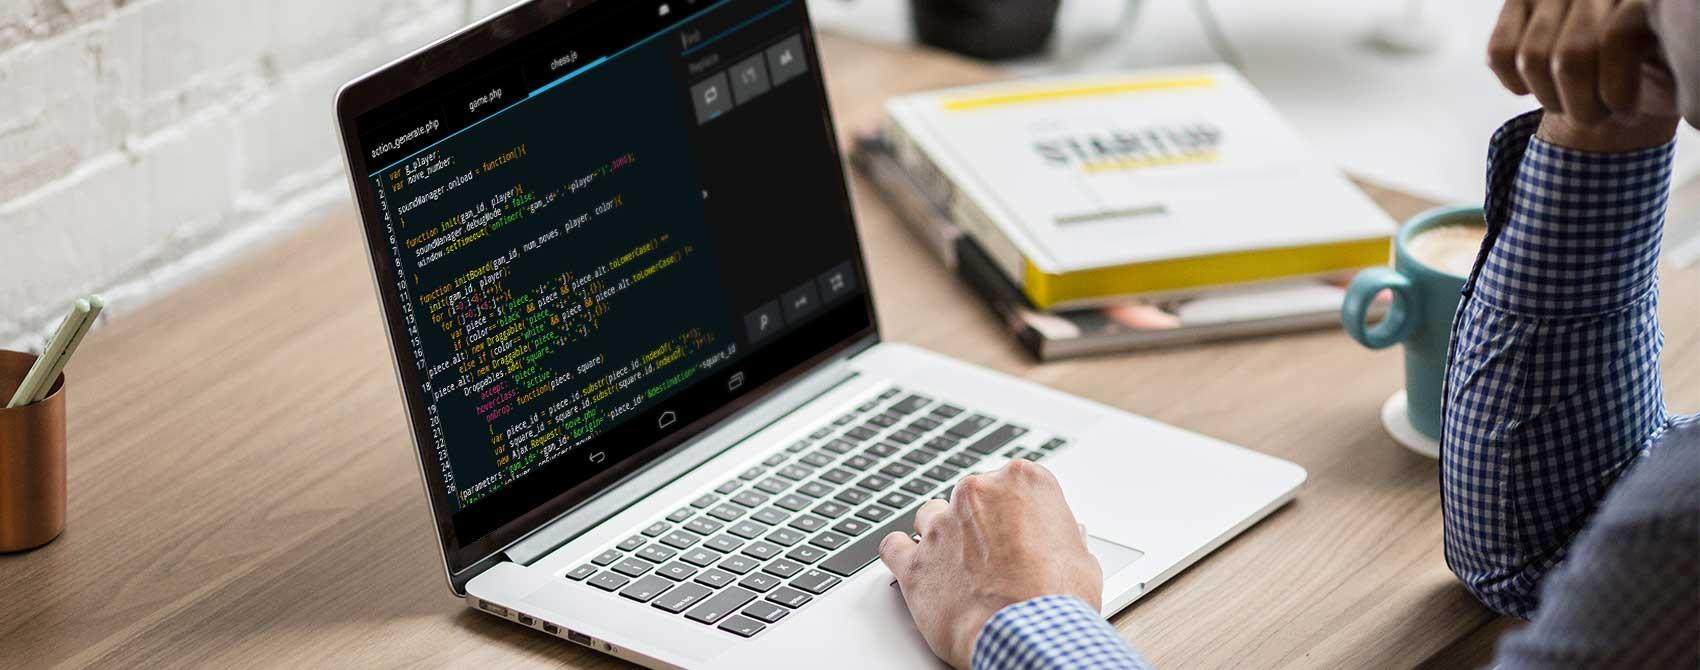 University of University of Utah Coding Boot Camp Curriculum